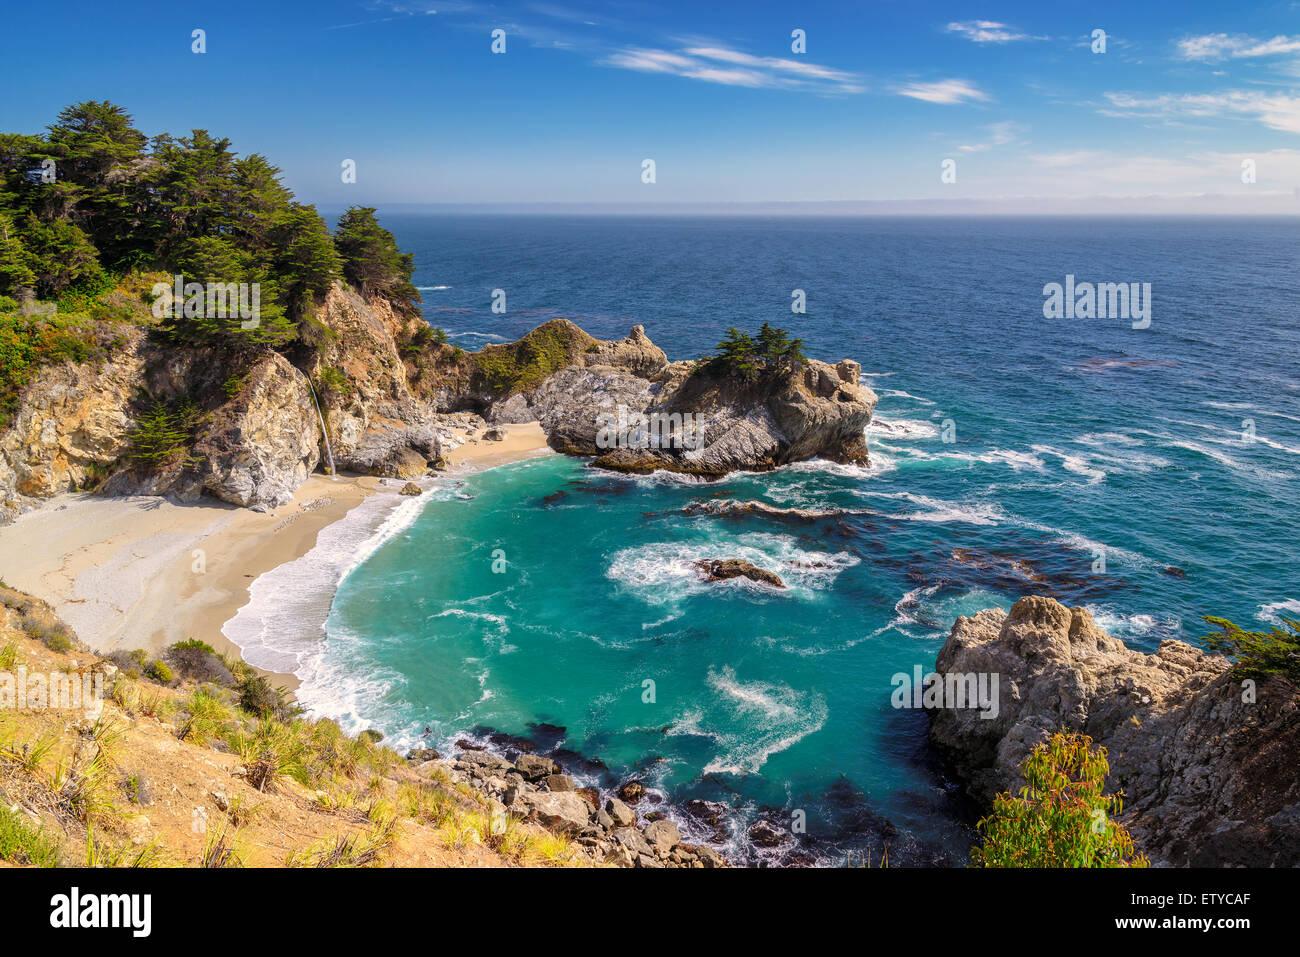 Fine beach and falls on Pacific coast, Julia Pfeiffer beach, Big Sur. California, USA - Stock Image